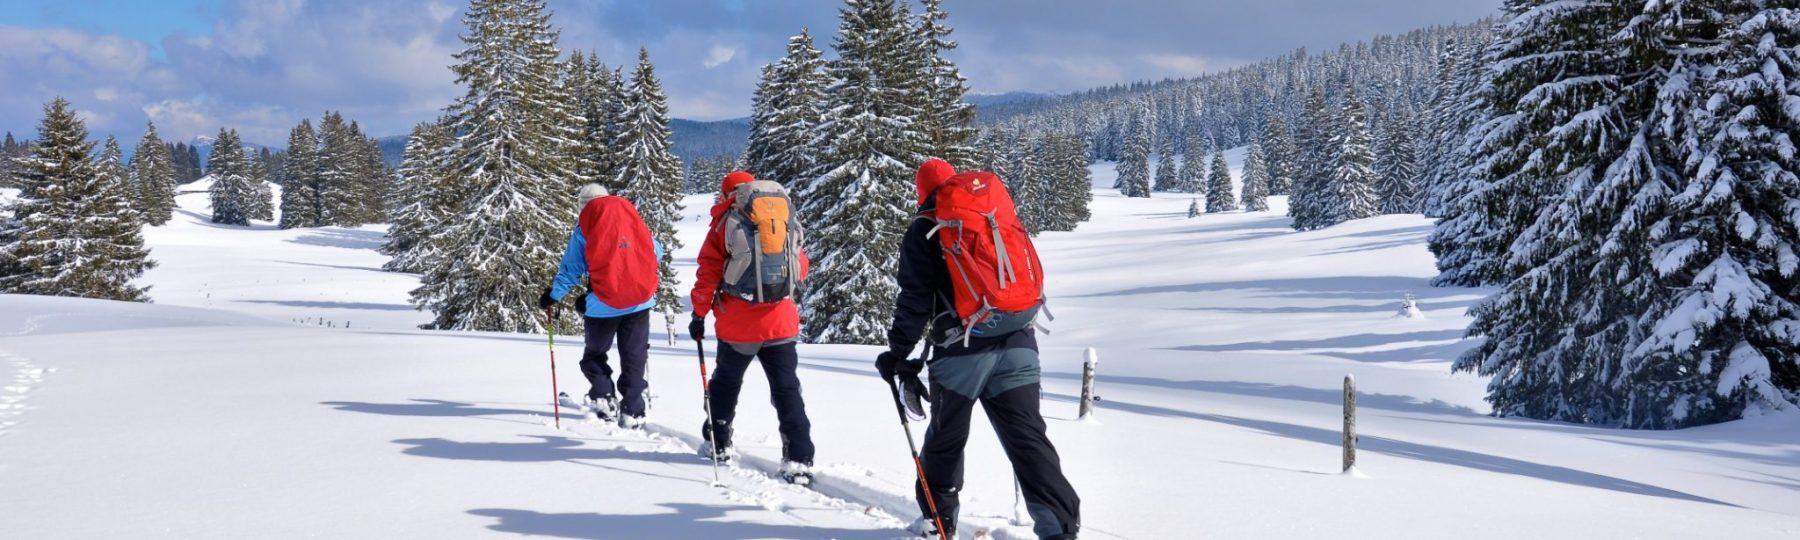 Groupe en ski de fond dans le Grandvaux © Jack Carrot/Jura Tourisme